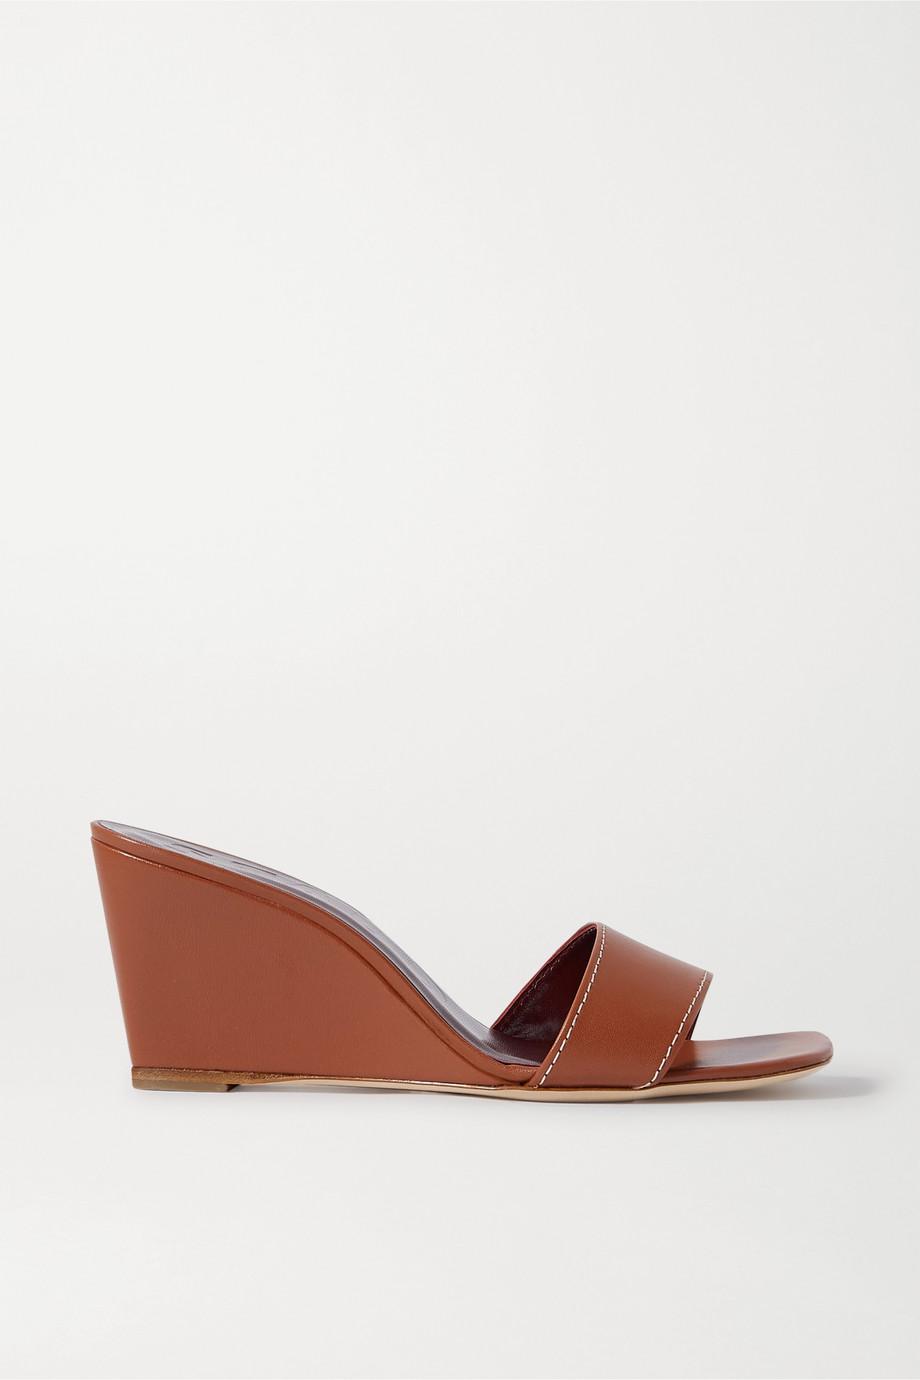 STAUD Billie topstitched leather wedge sandals